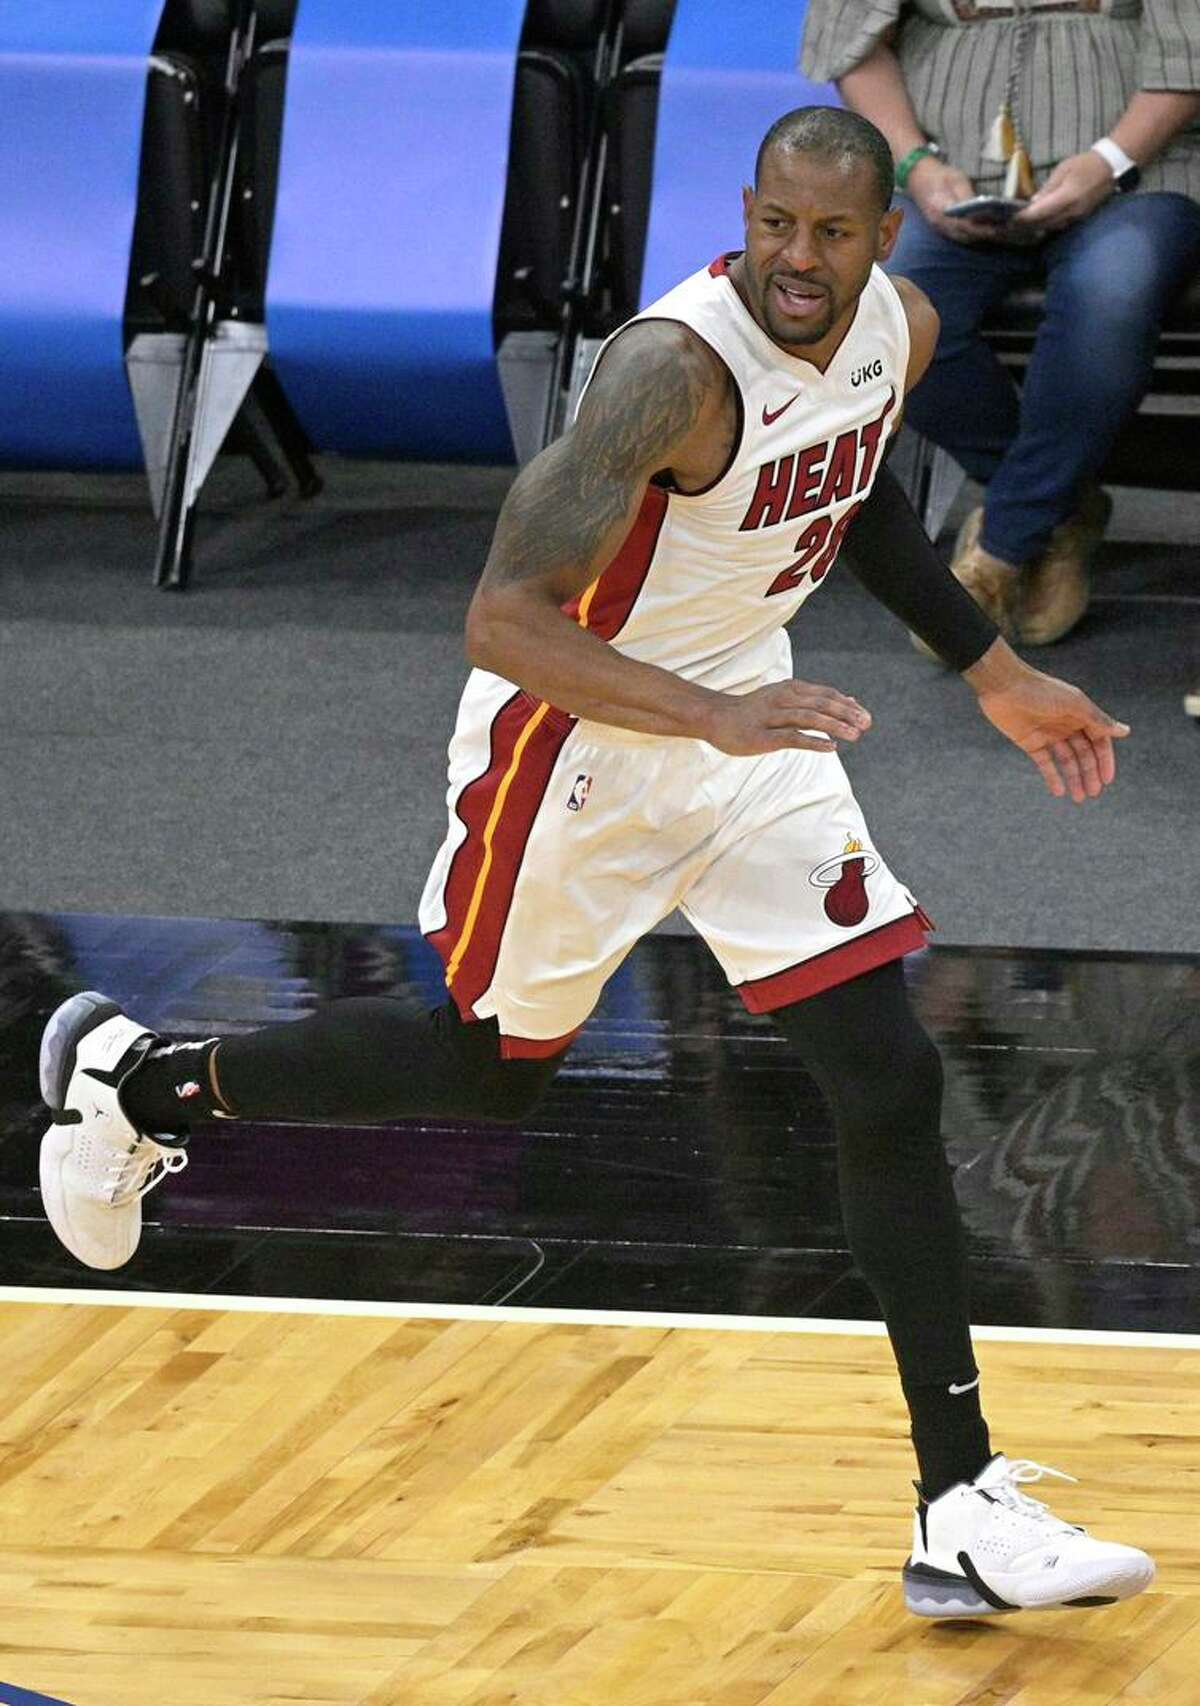 Miami Heat forward Andre Iguodala (28) celebrates after scoring a 3-point basket during the second half of an NBA basketball game against the Orlando Magic on Sunday, March 14, 2021, in Orlando, Fla. (AP Photo/Phelan M. Ebenhack)